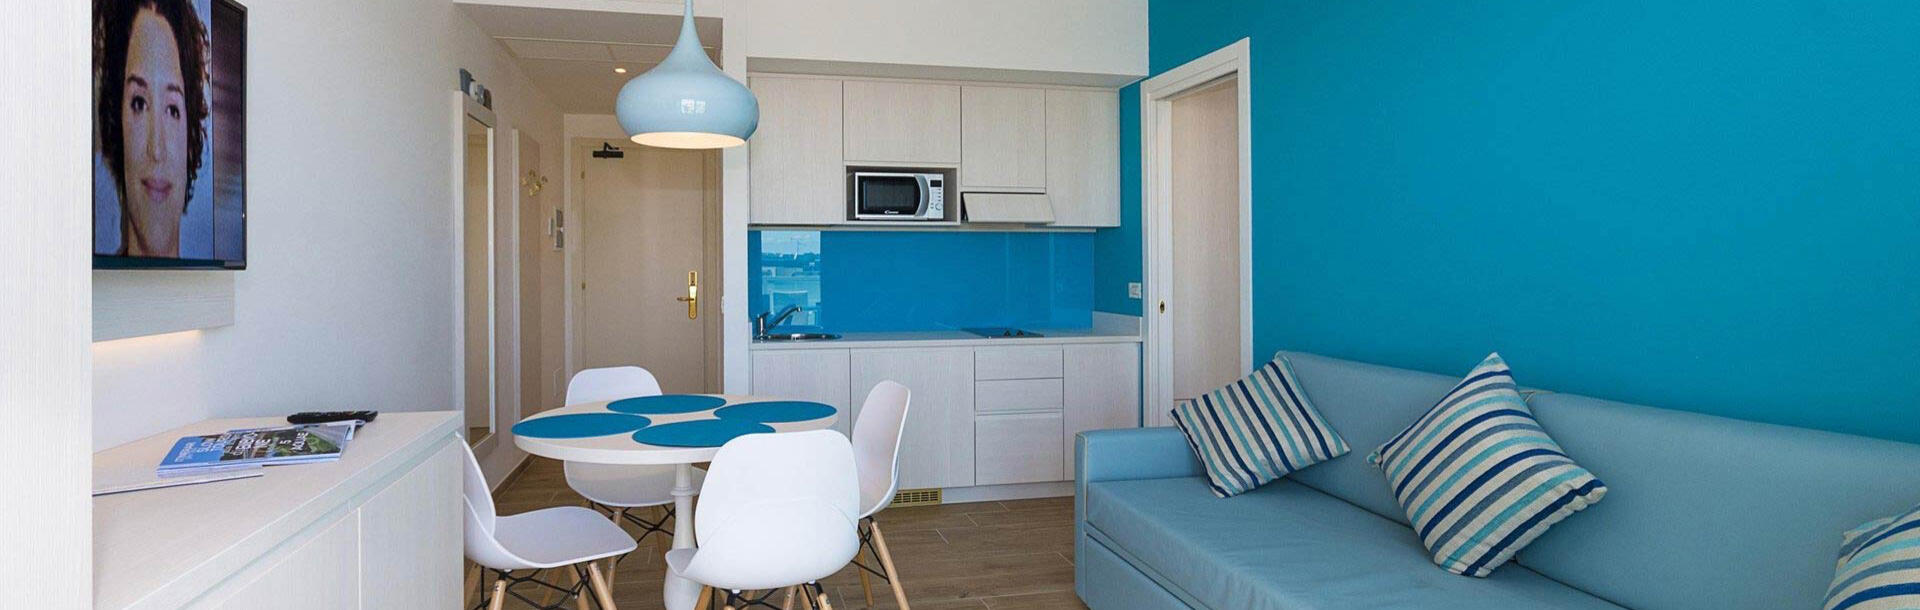 hotel-montecarlo hu family-living-lakosztaly-bibione 013